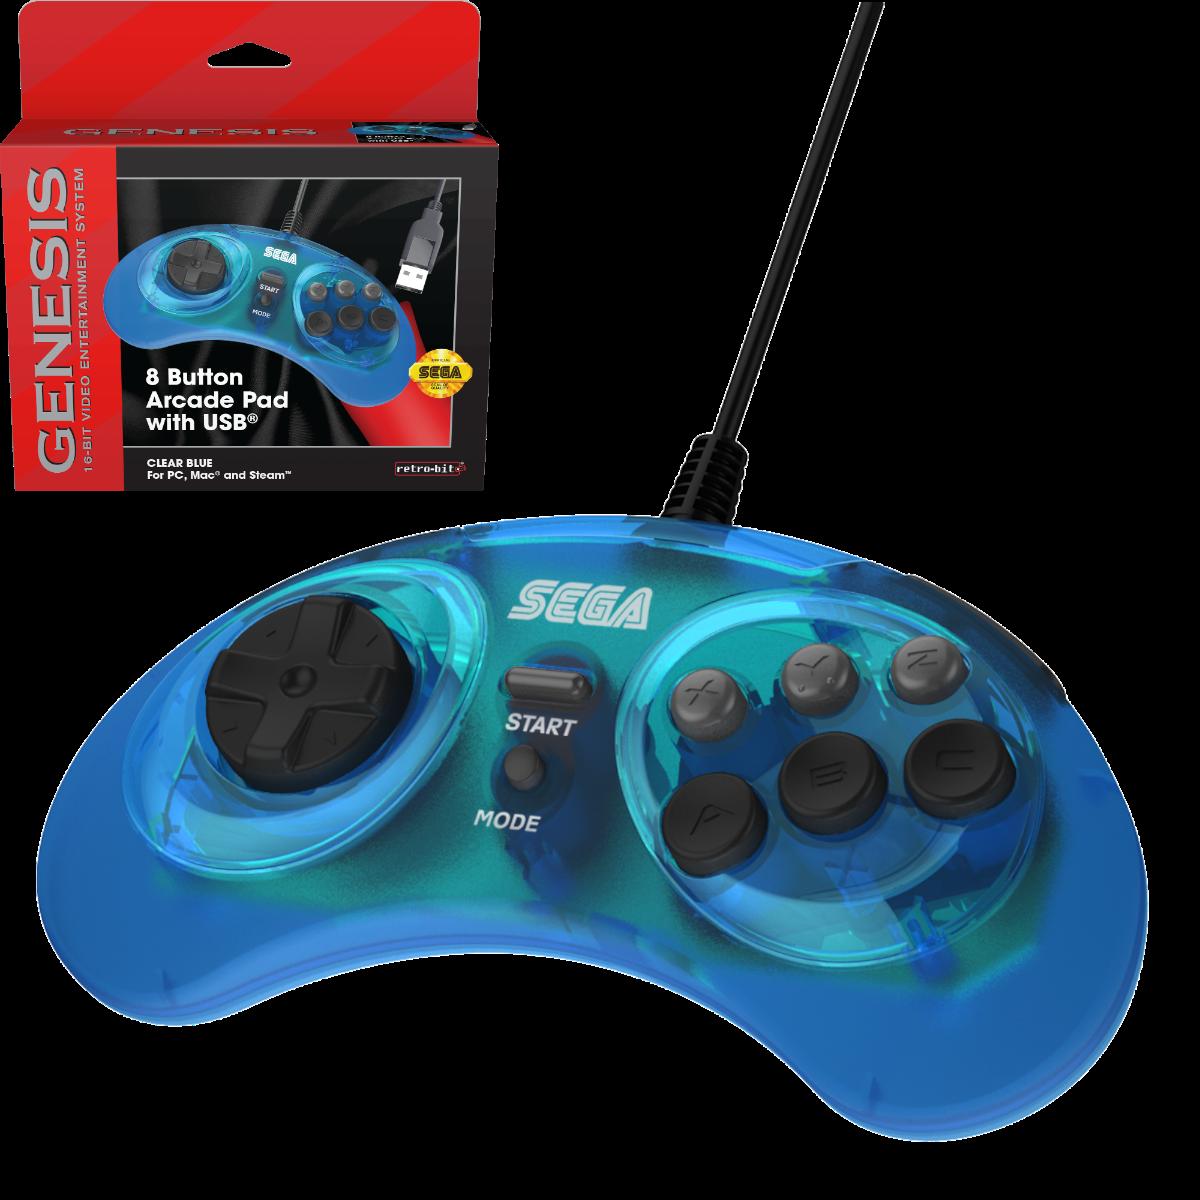 SEGA, Genesis, Arcade Pad, 8 Button, Clear Blue, USB